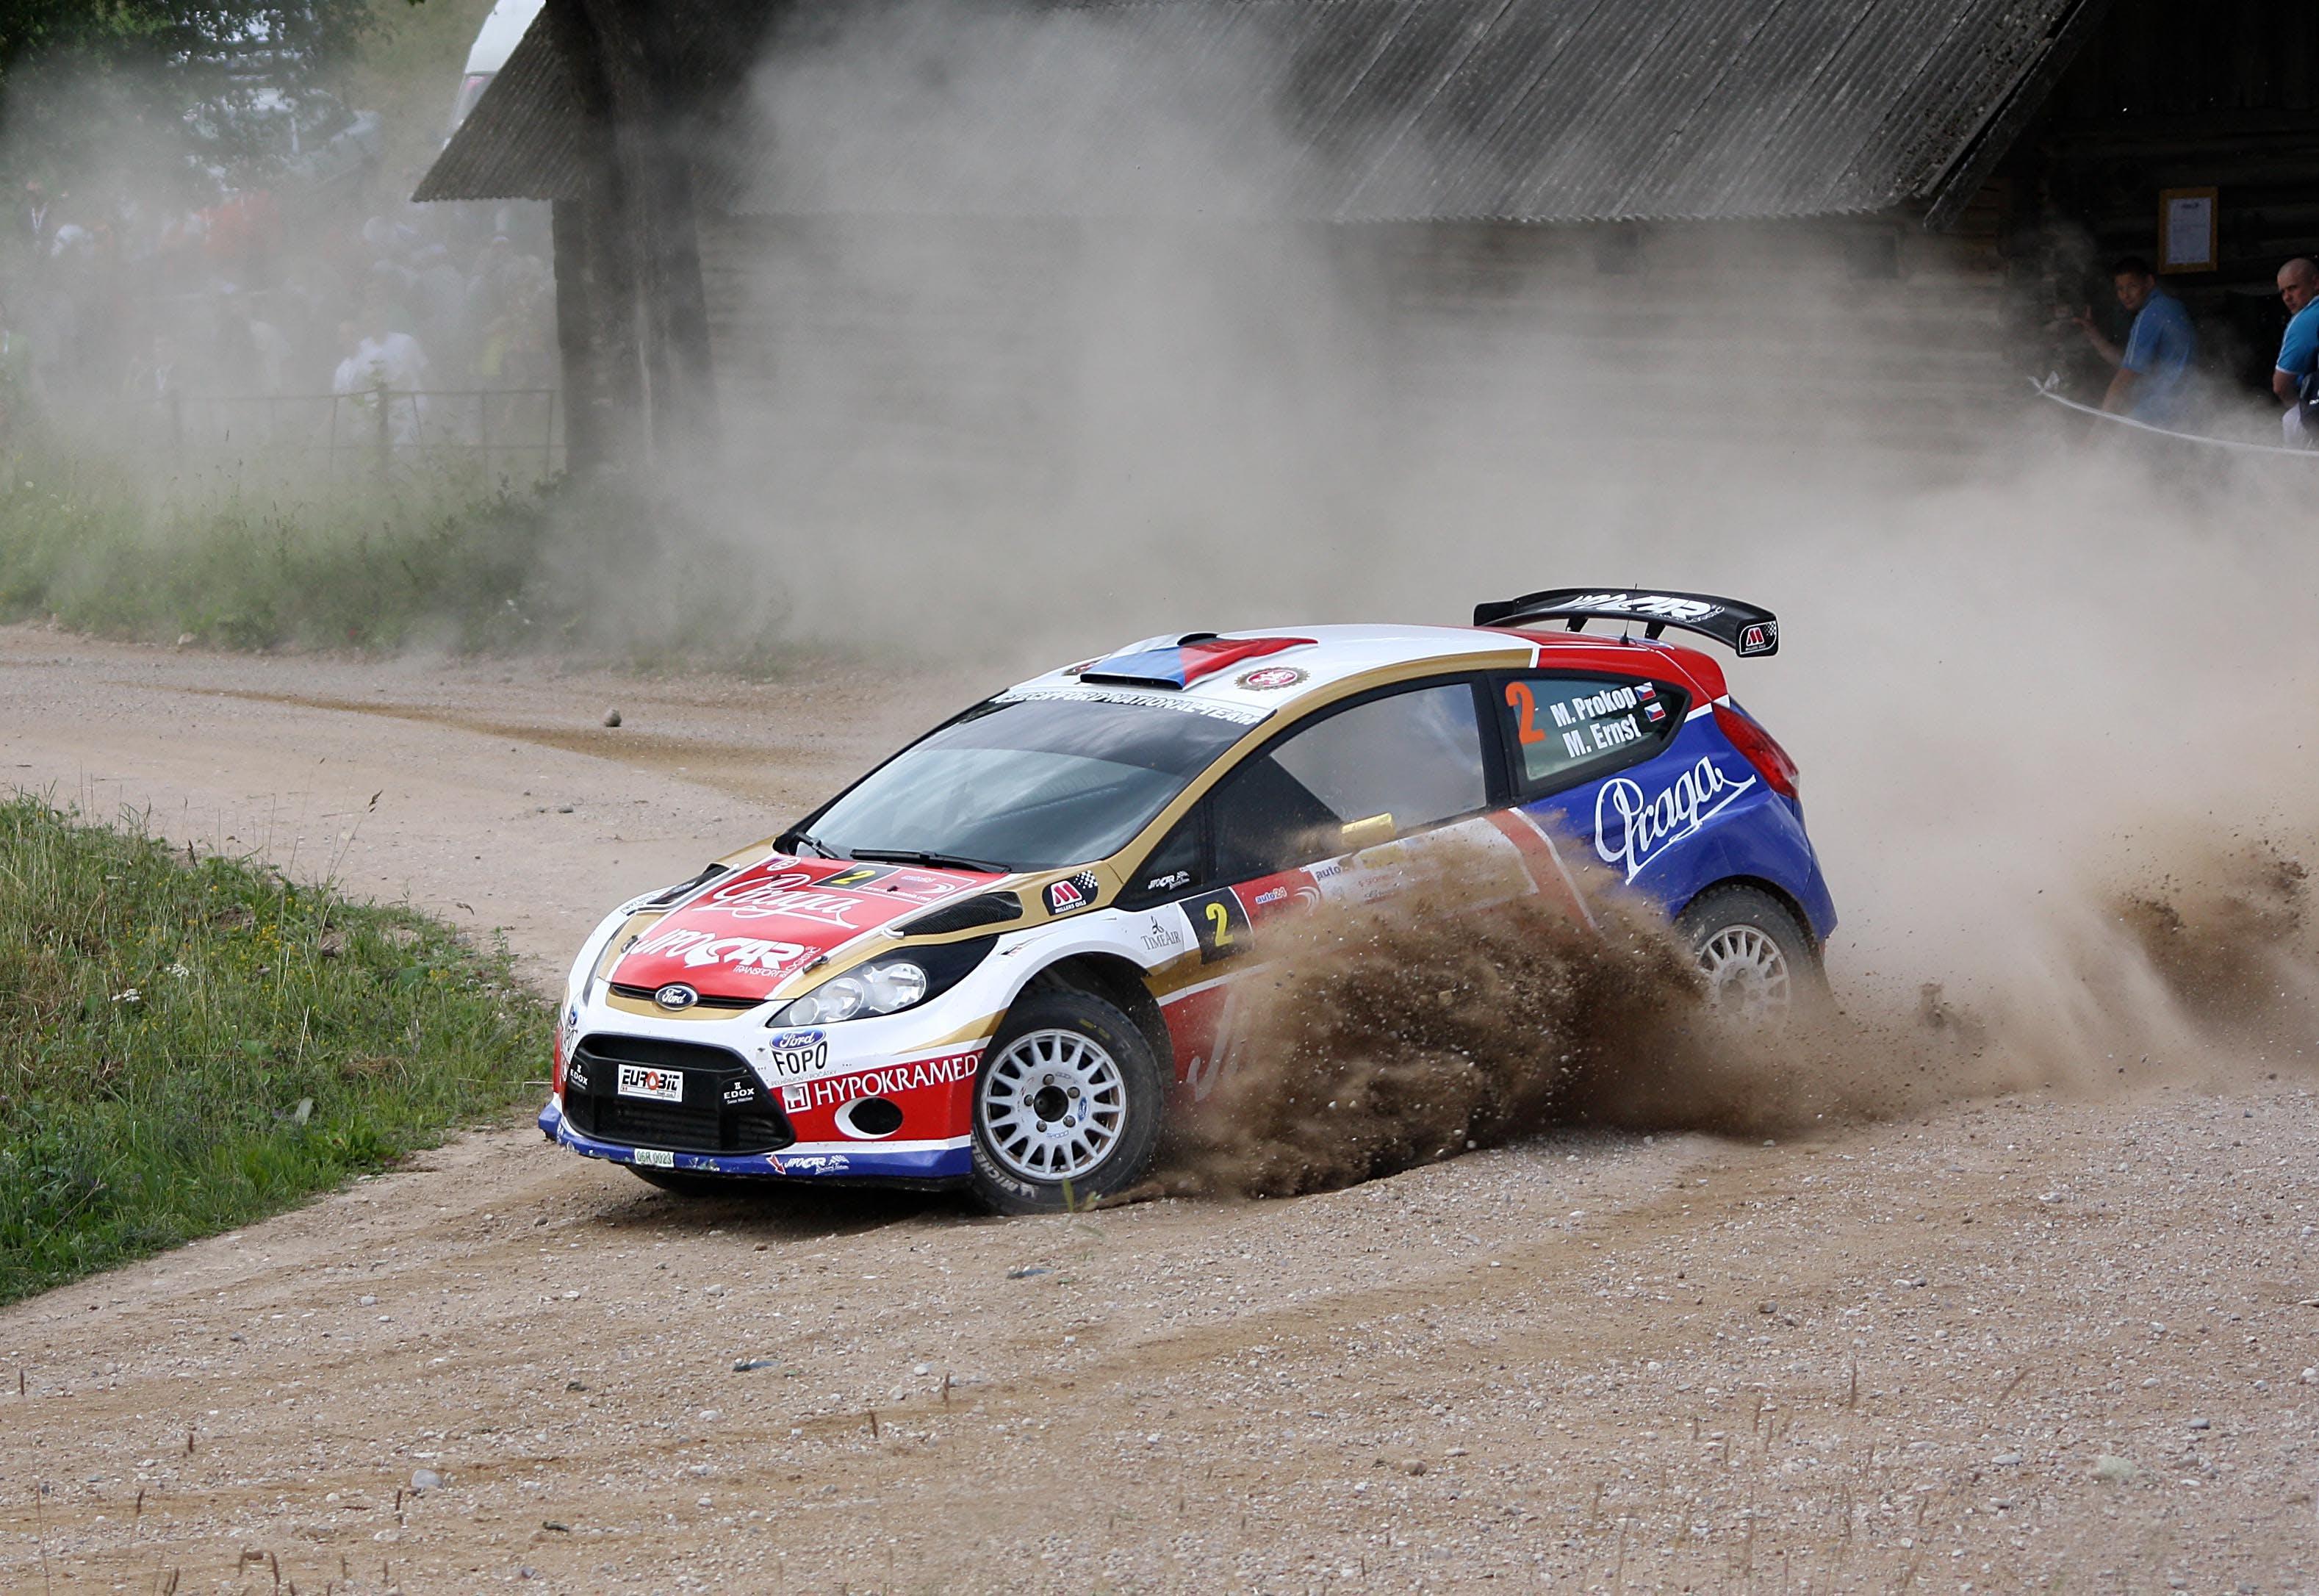 Free stock photo of estonia, gravel road, rally car